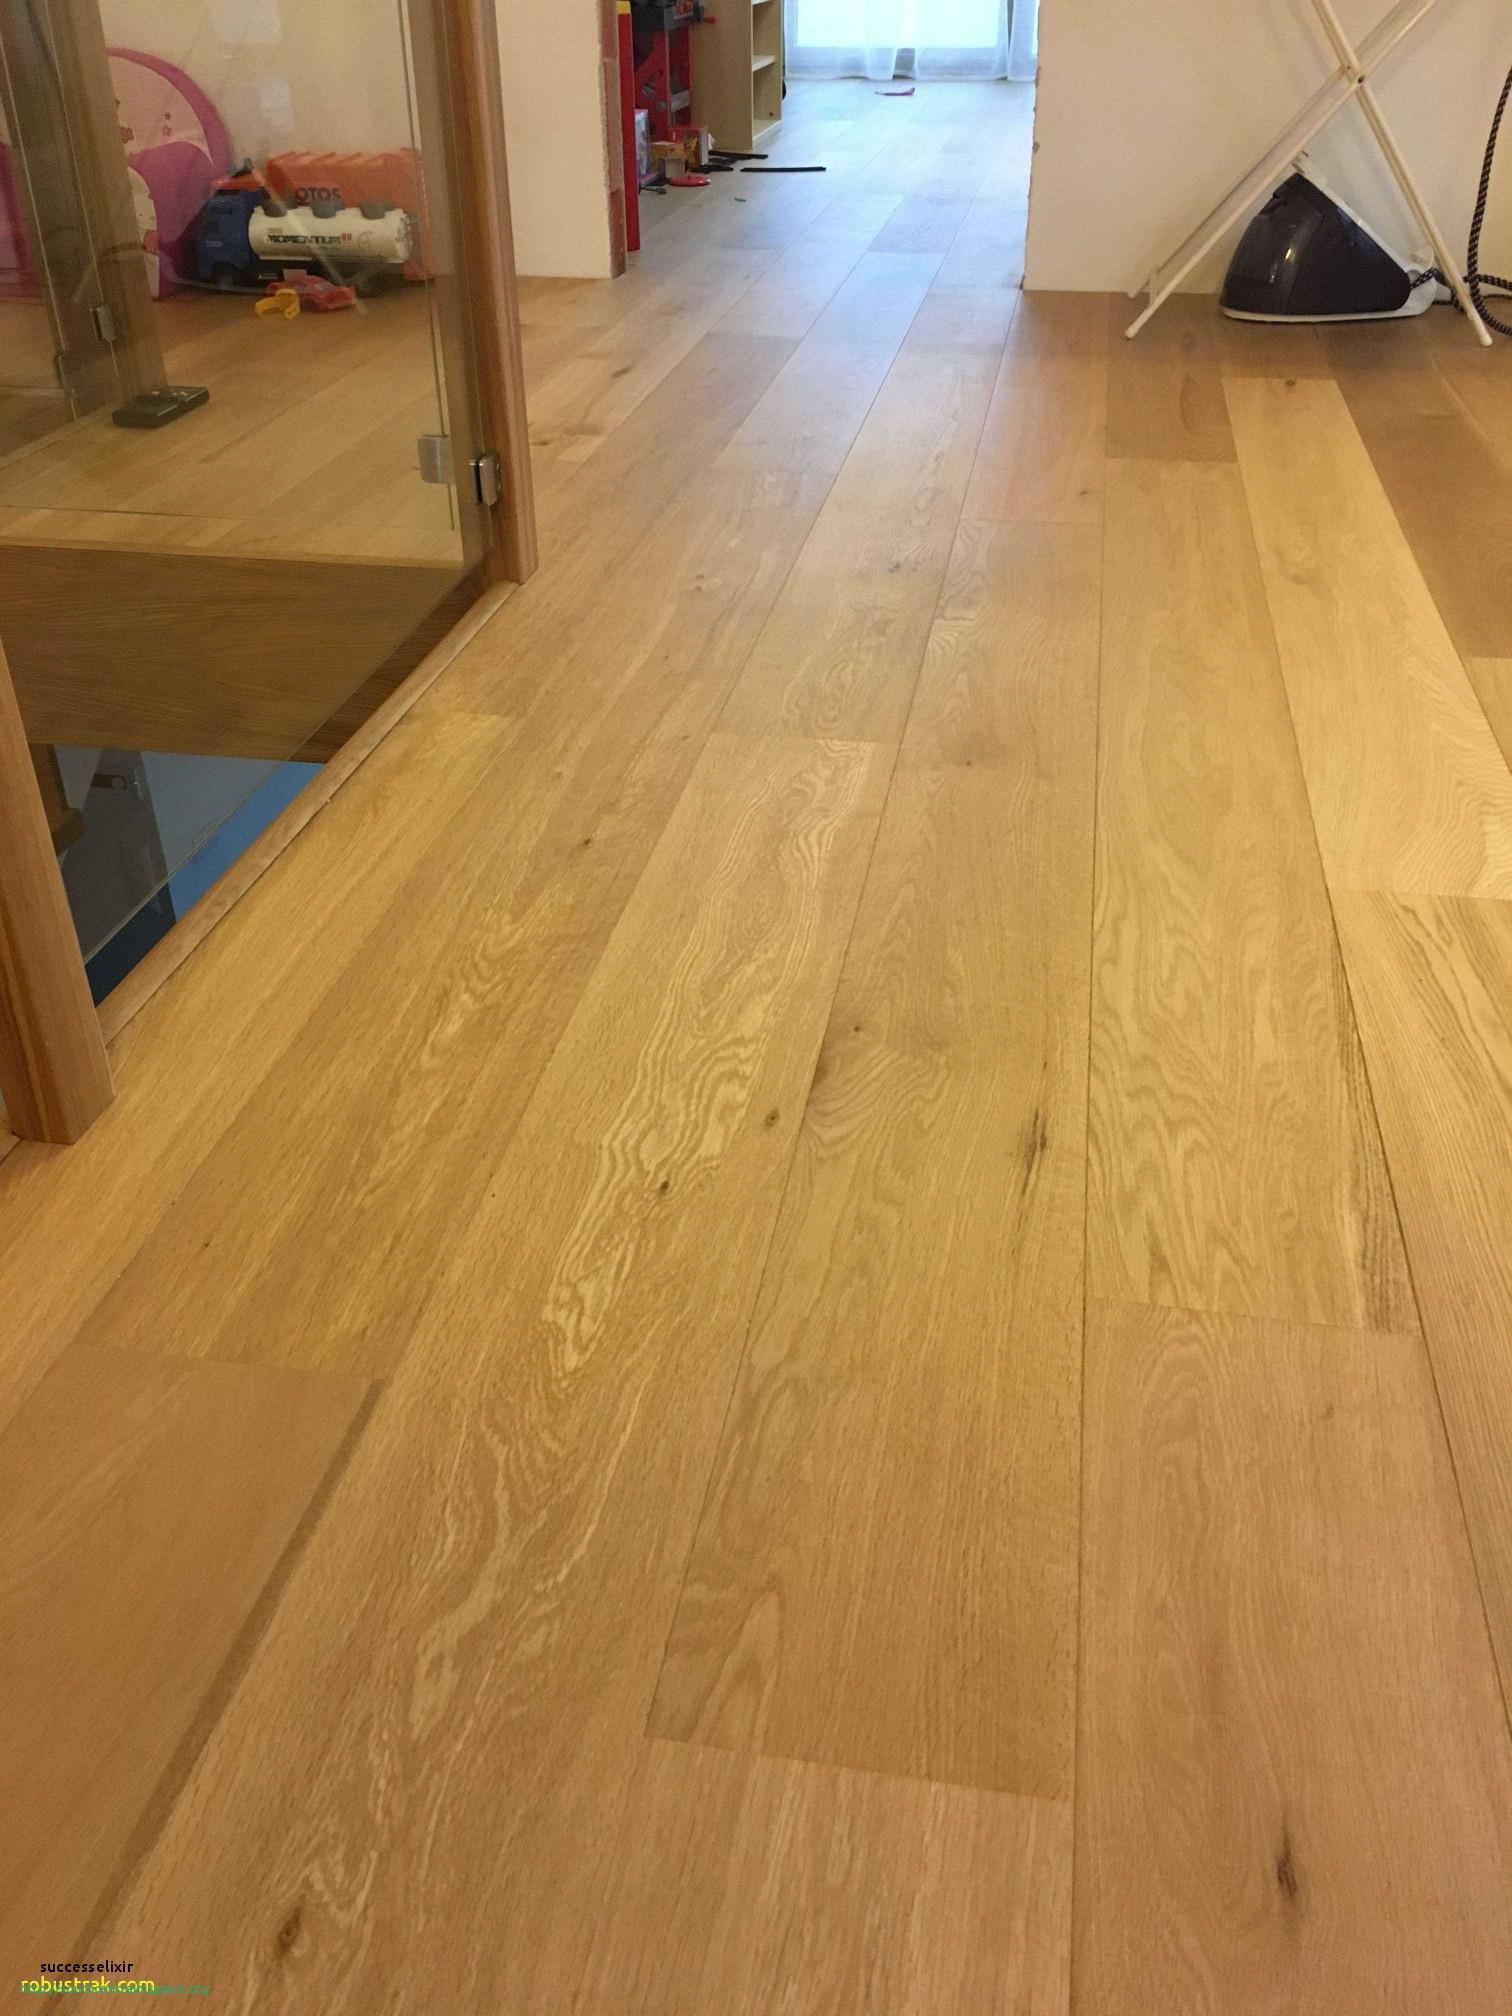 pergo hardwood flooring reviews of laminate or wood flooring which is better laminate flooring ideas throughout best place to laminate flooring inspirant looks like wood new naturalny dub od